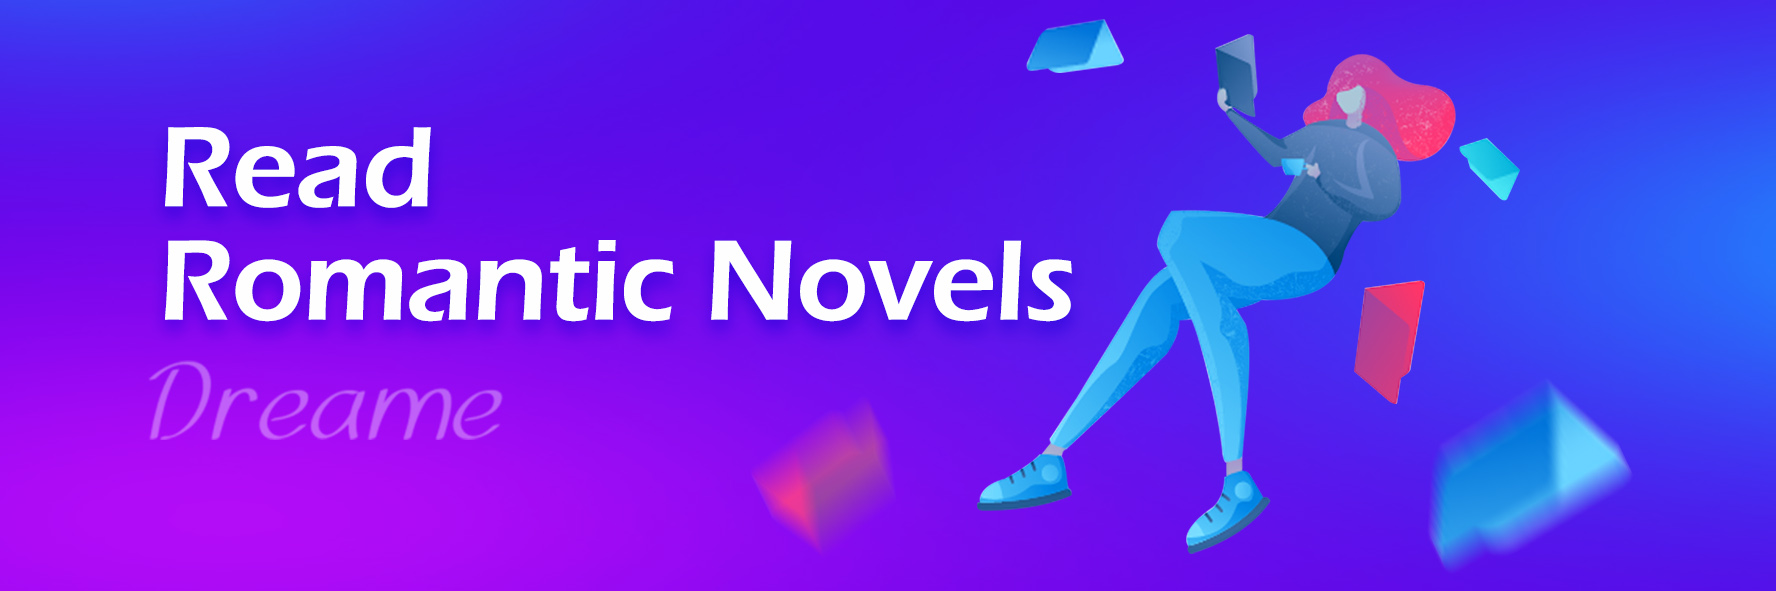 Dreame - Romantic Fictions cover